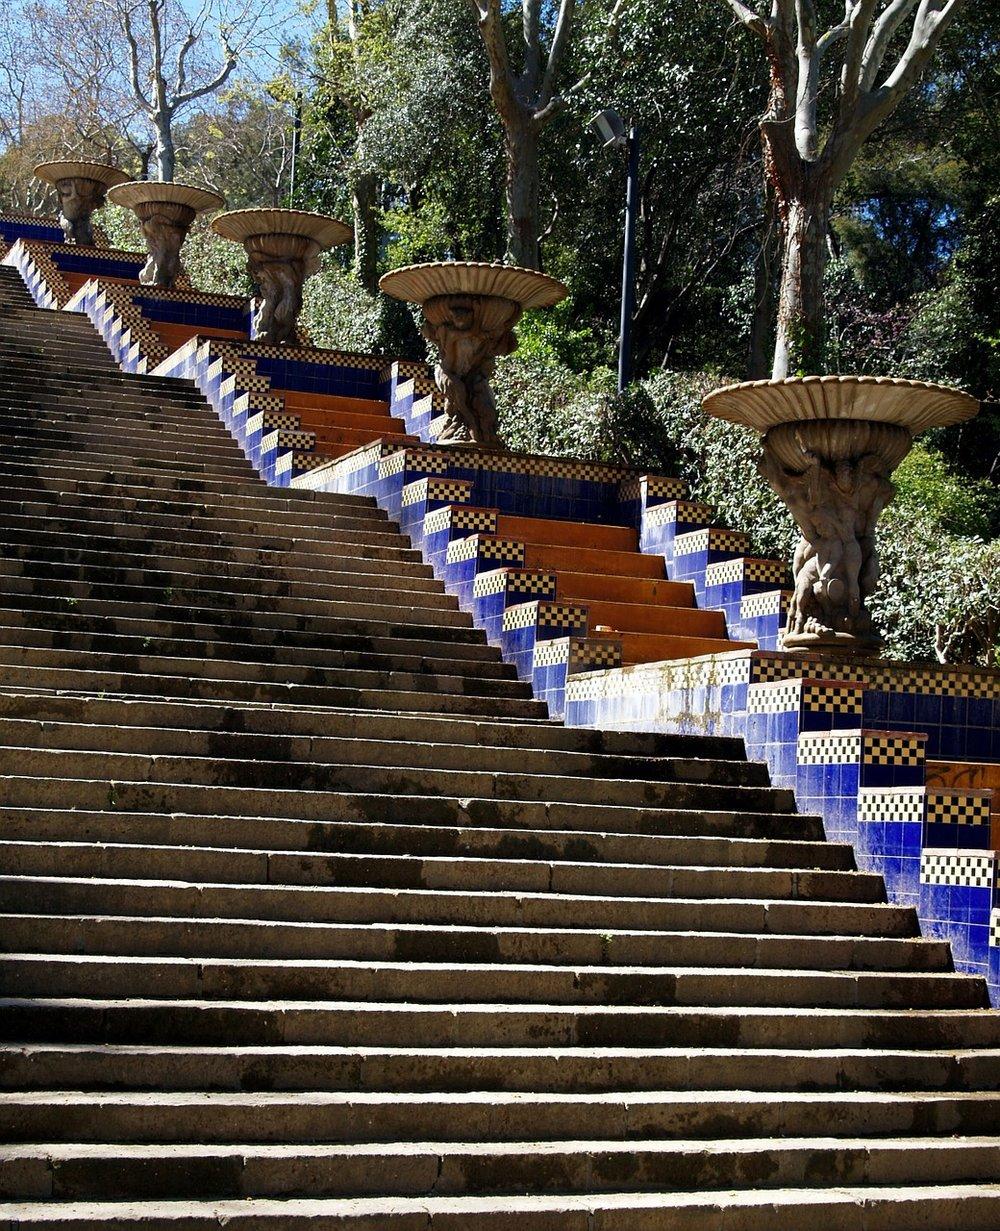 barcelona-1523832_1280.jpg